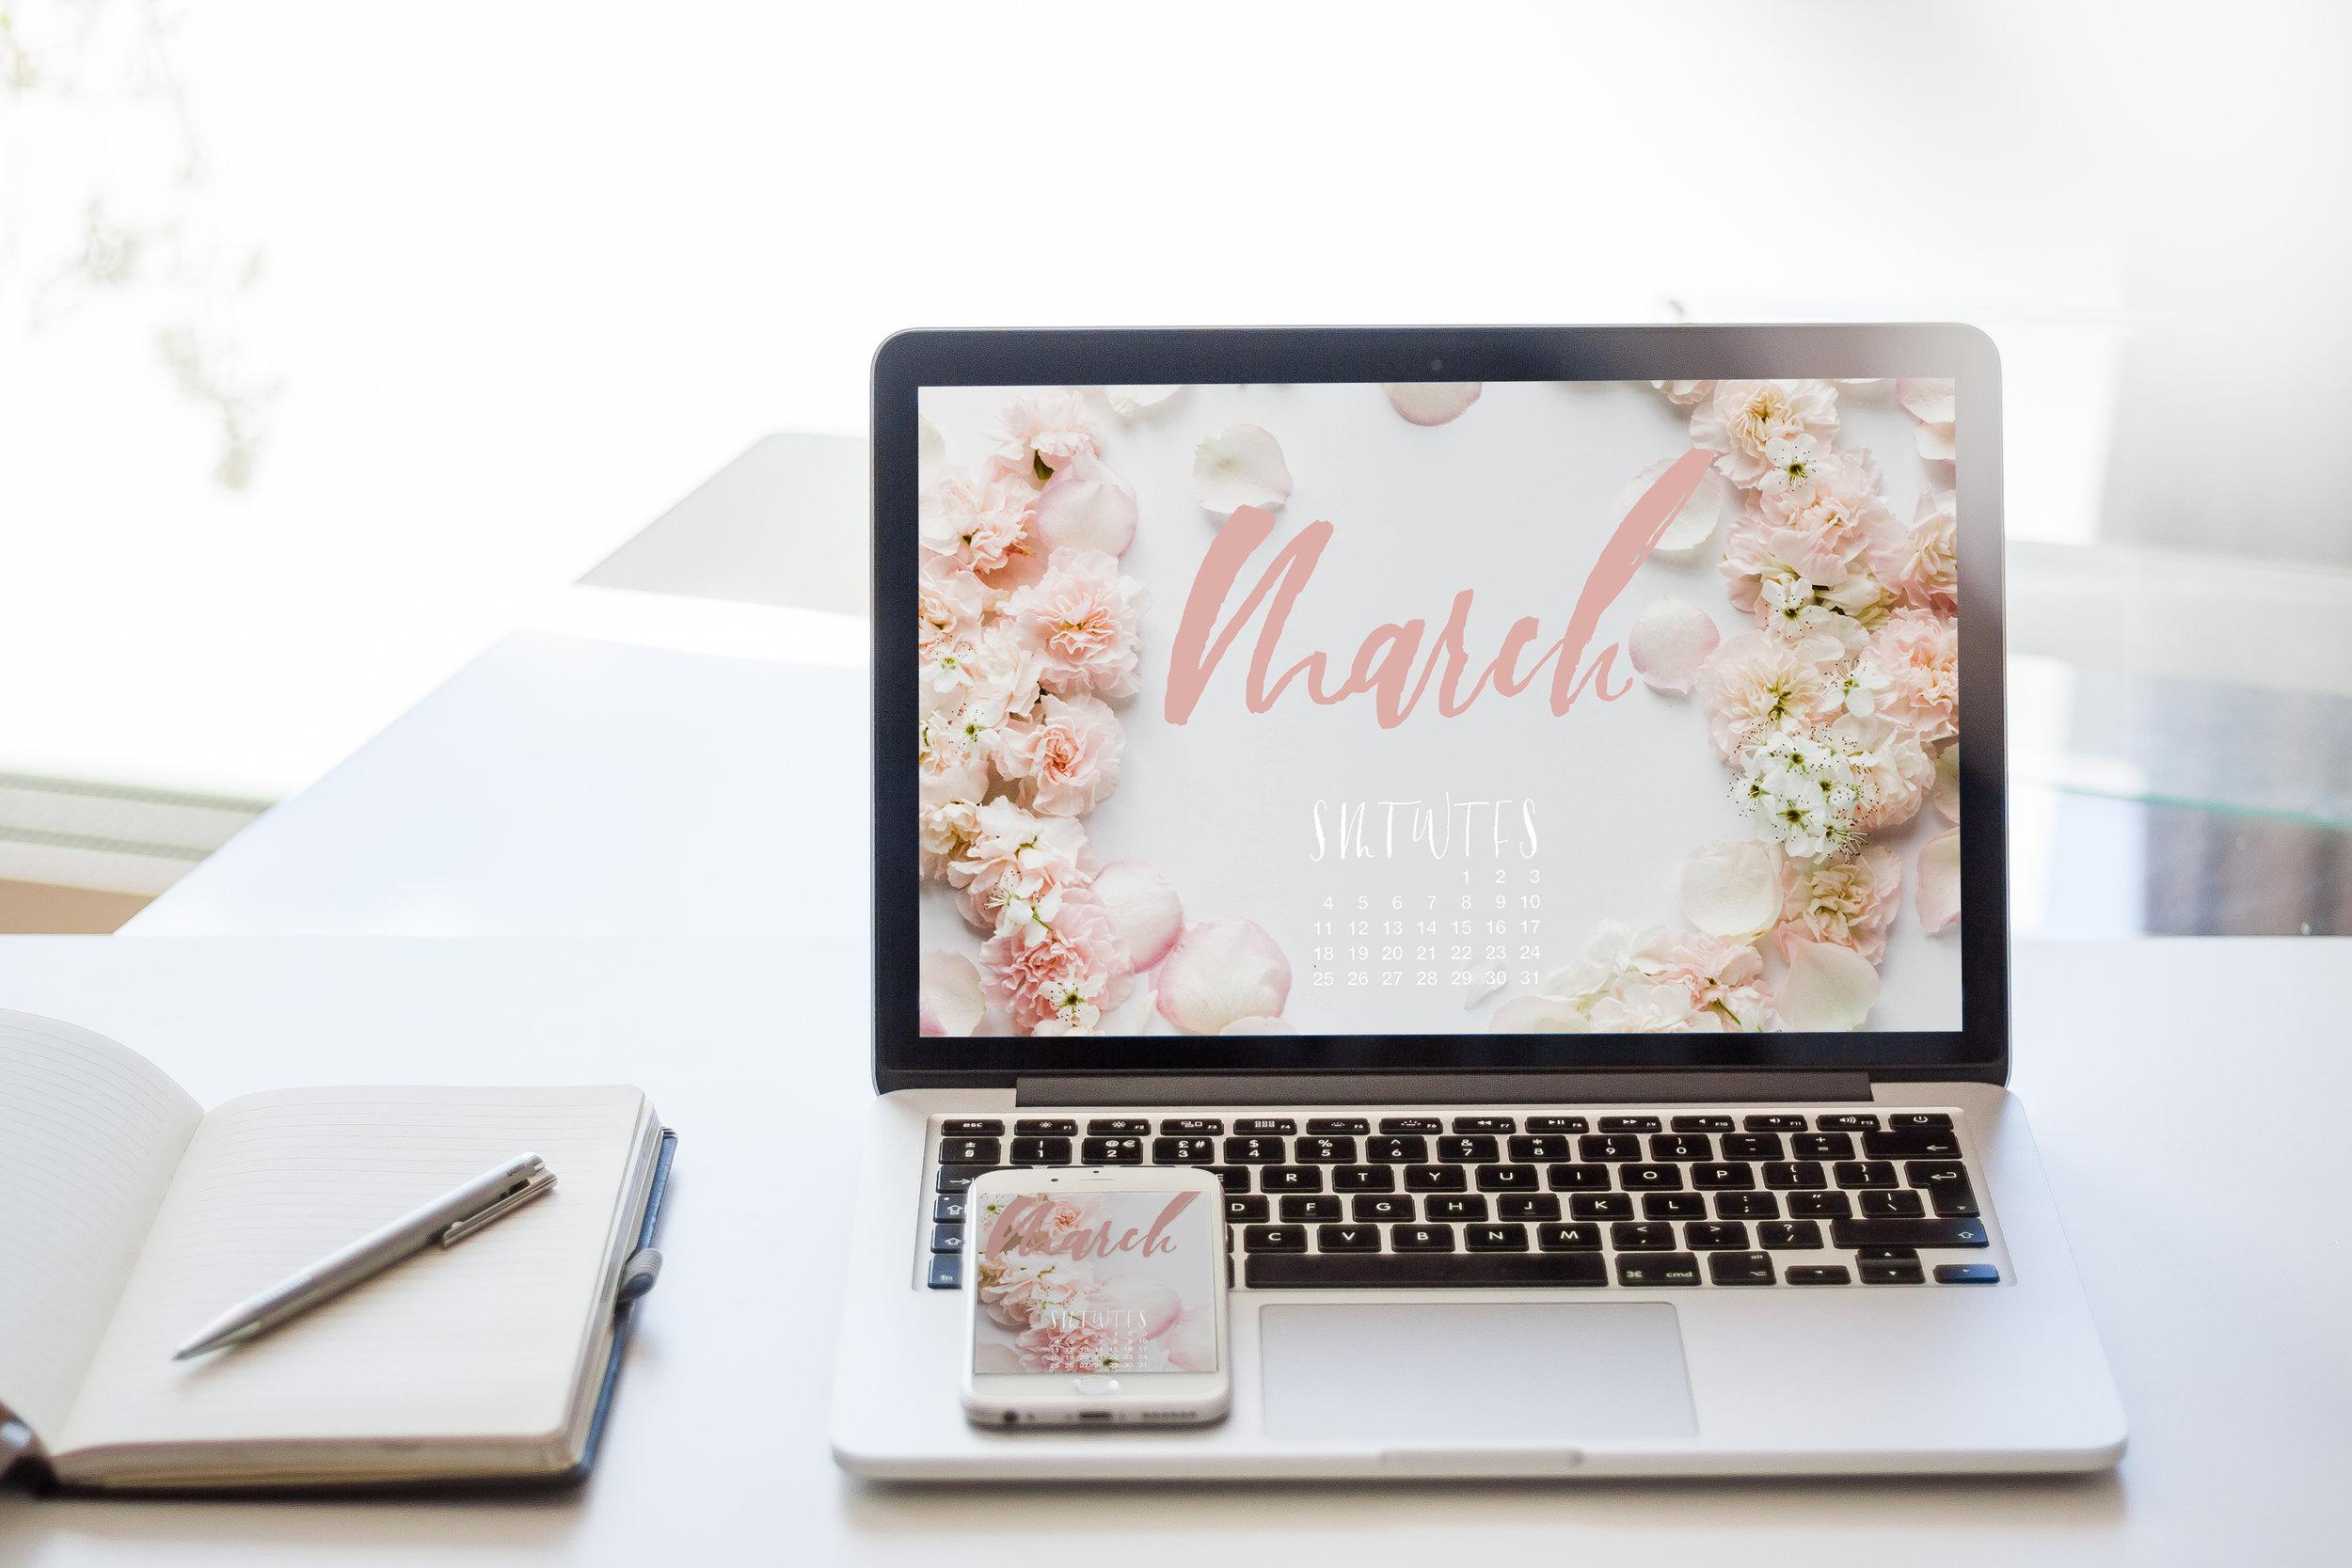 Free March 2018 Calendar Desktop and iPhone Wallpaper